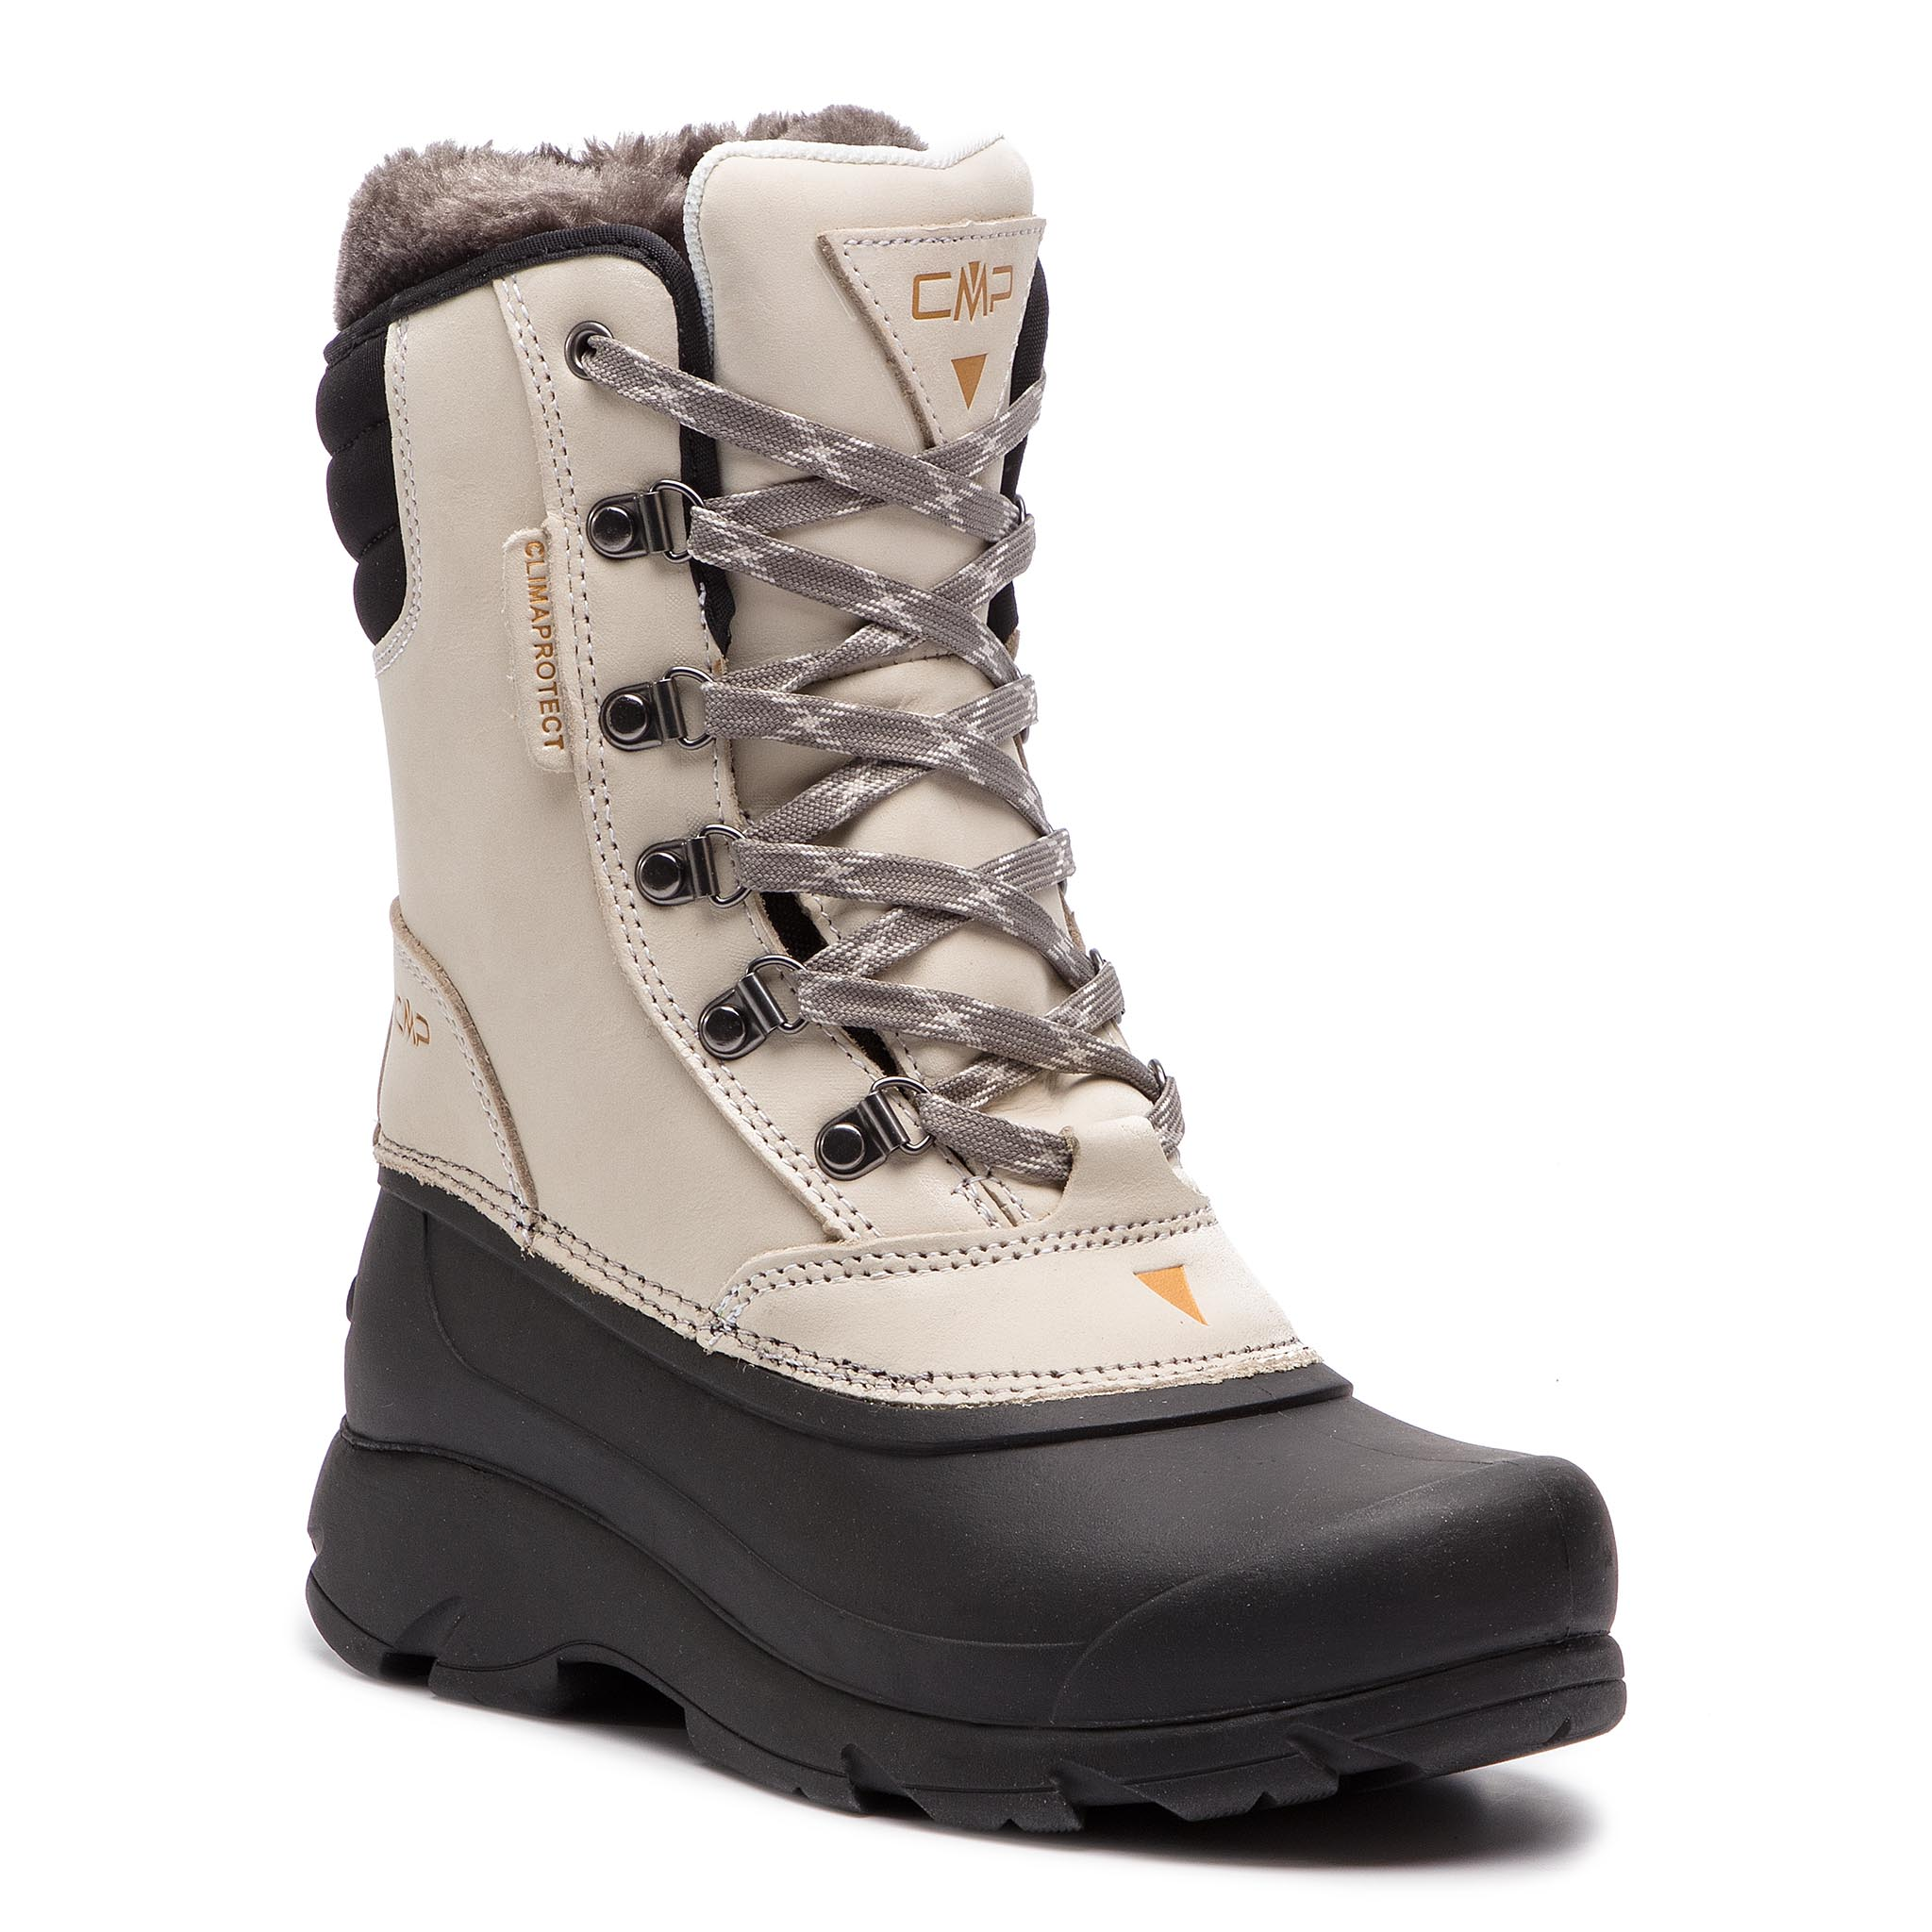 f4fcf72cc1 Snehule CMP - Knos Wmn Snow Boot Wp 38Q4556 Rock A121 - Glami.sk